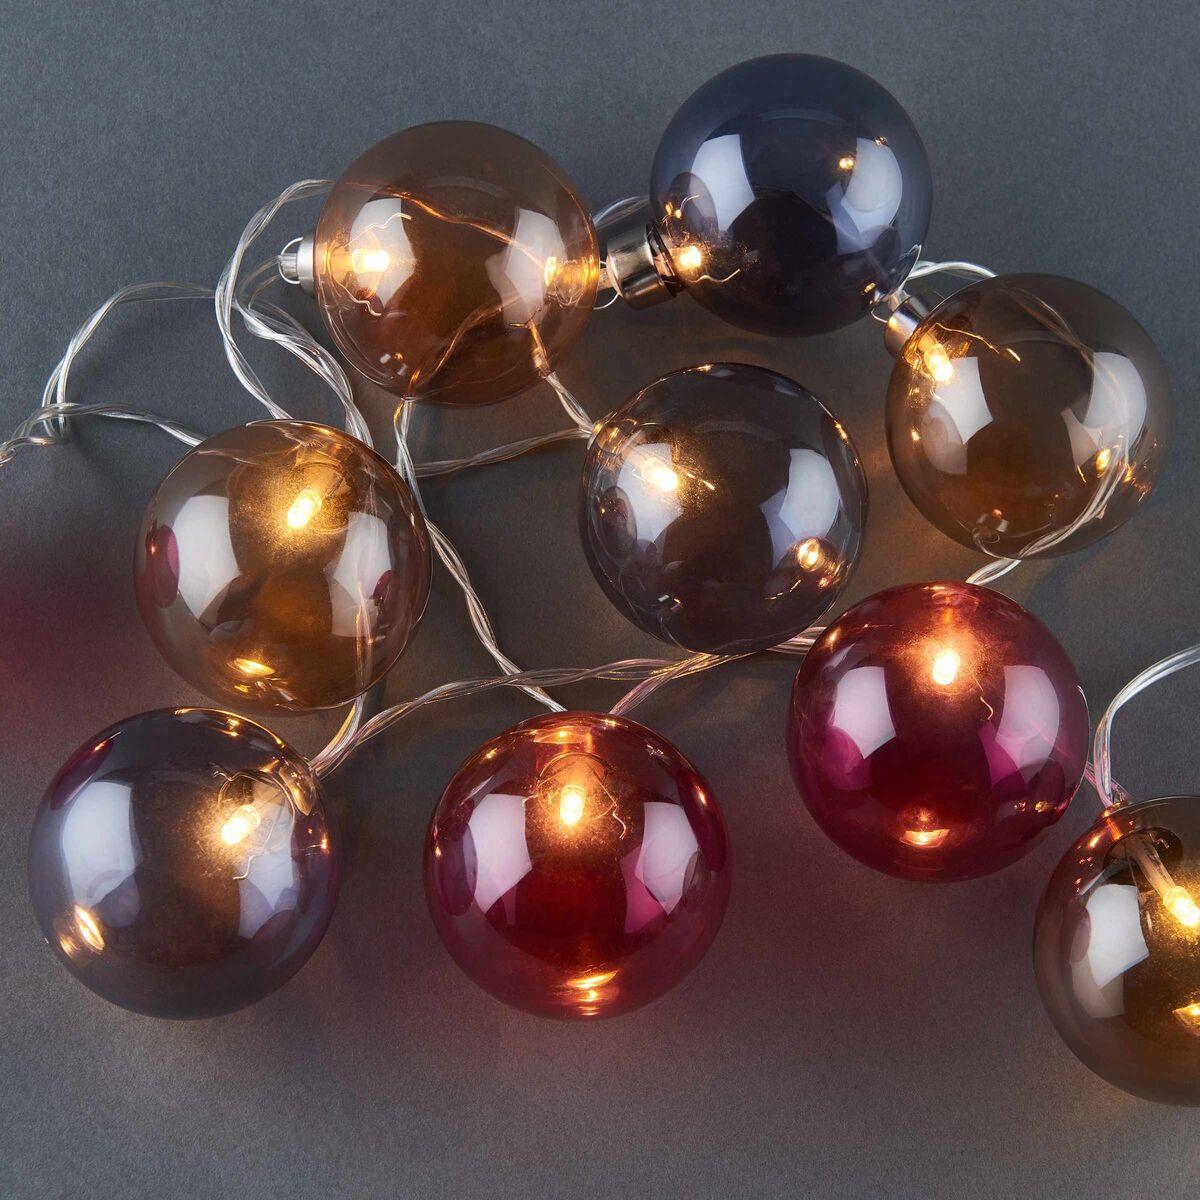 Butler Christmas Lights 2020 TRICOLORE LK Glaskugel, getönt, 10L in 2020 | Jewelry, Pearl